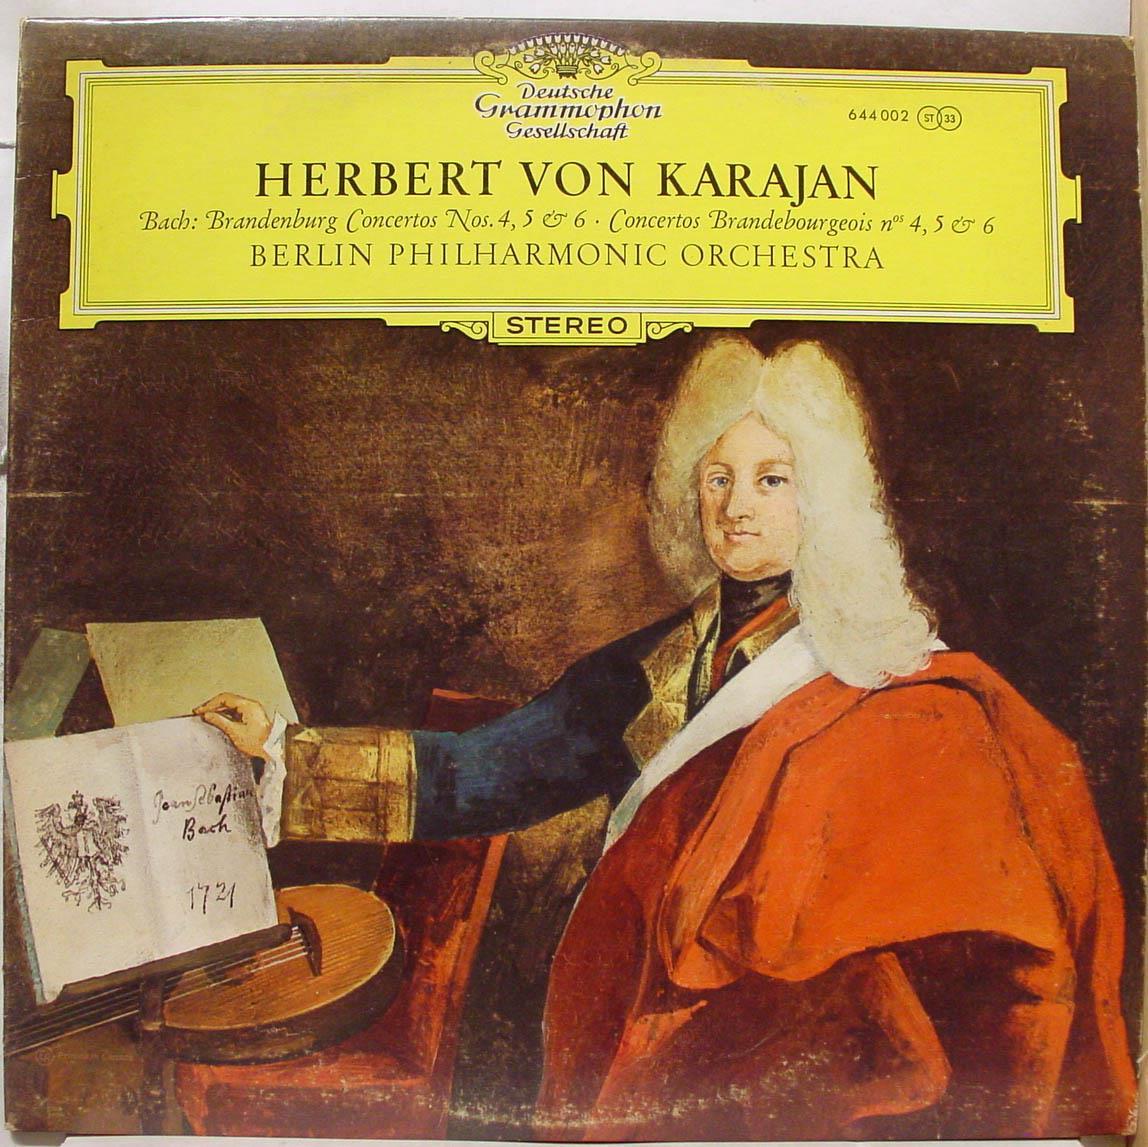 Herbert Von Karajan - Karajan Bach Brandenburg Concertos Nos 4, 5 & 6 Lp Vg+ 644 002 Canada (bach Brandenburg Concerto